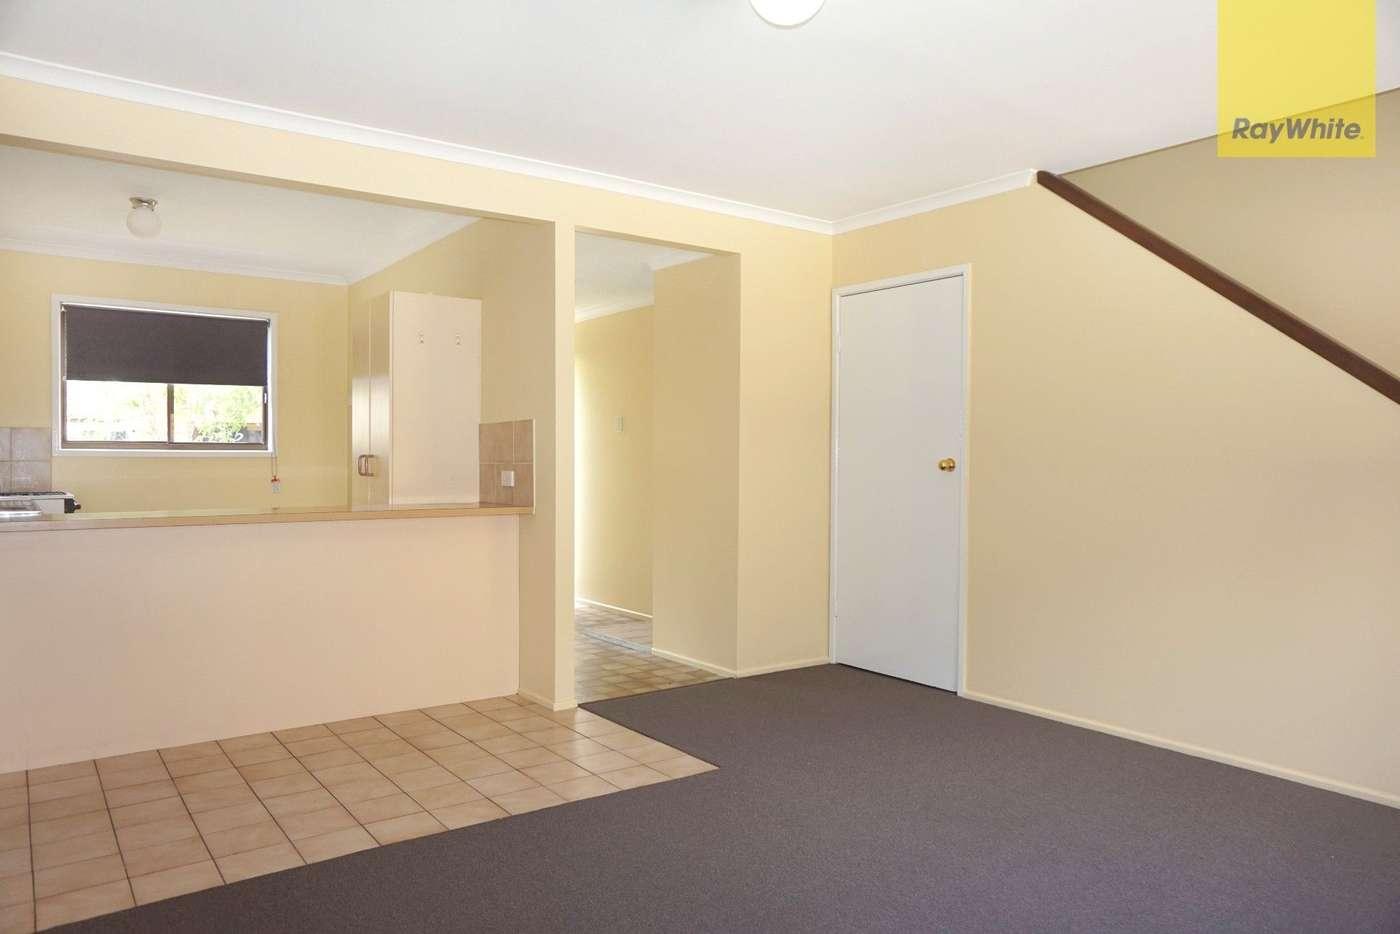 Main view of Homely house listing, 43/111 Kingston Road, Woodridge QLD 4114